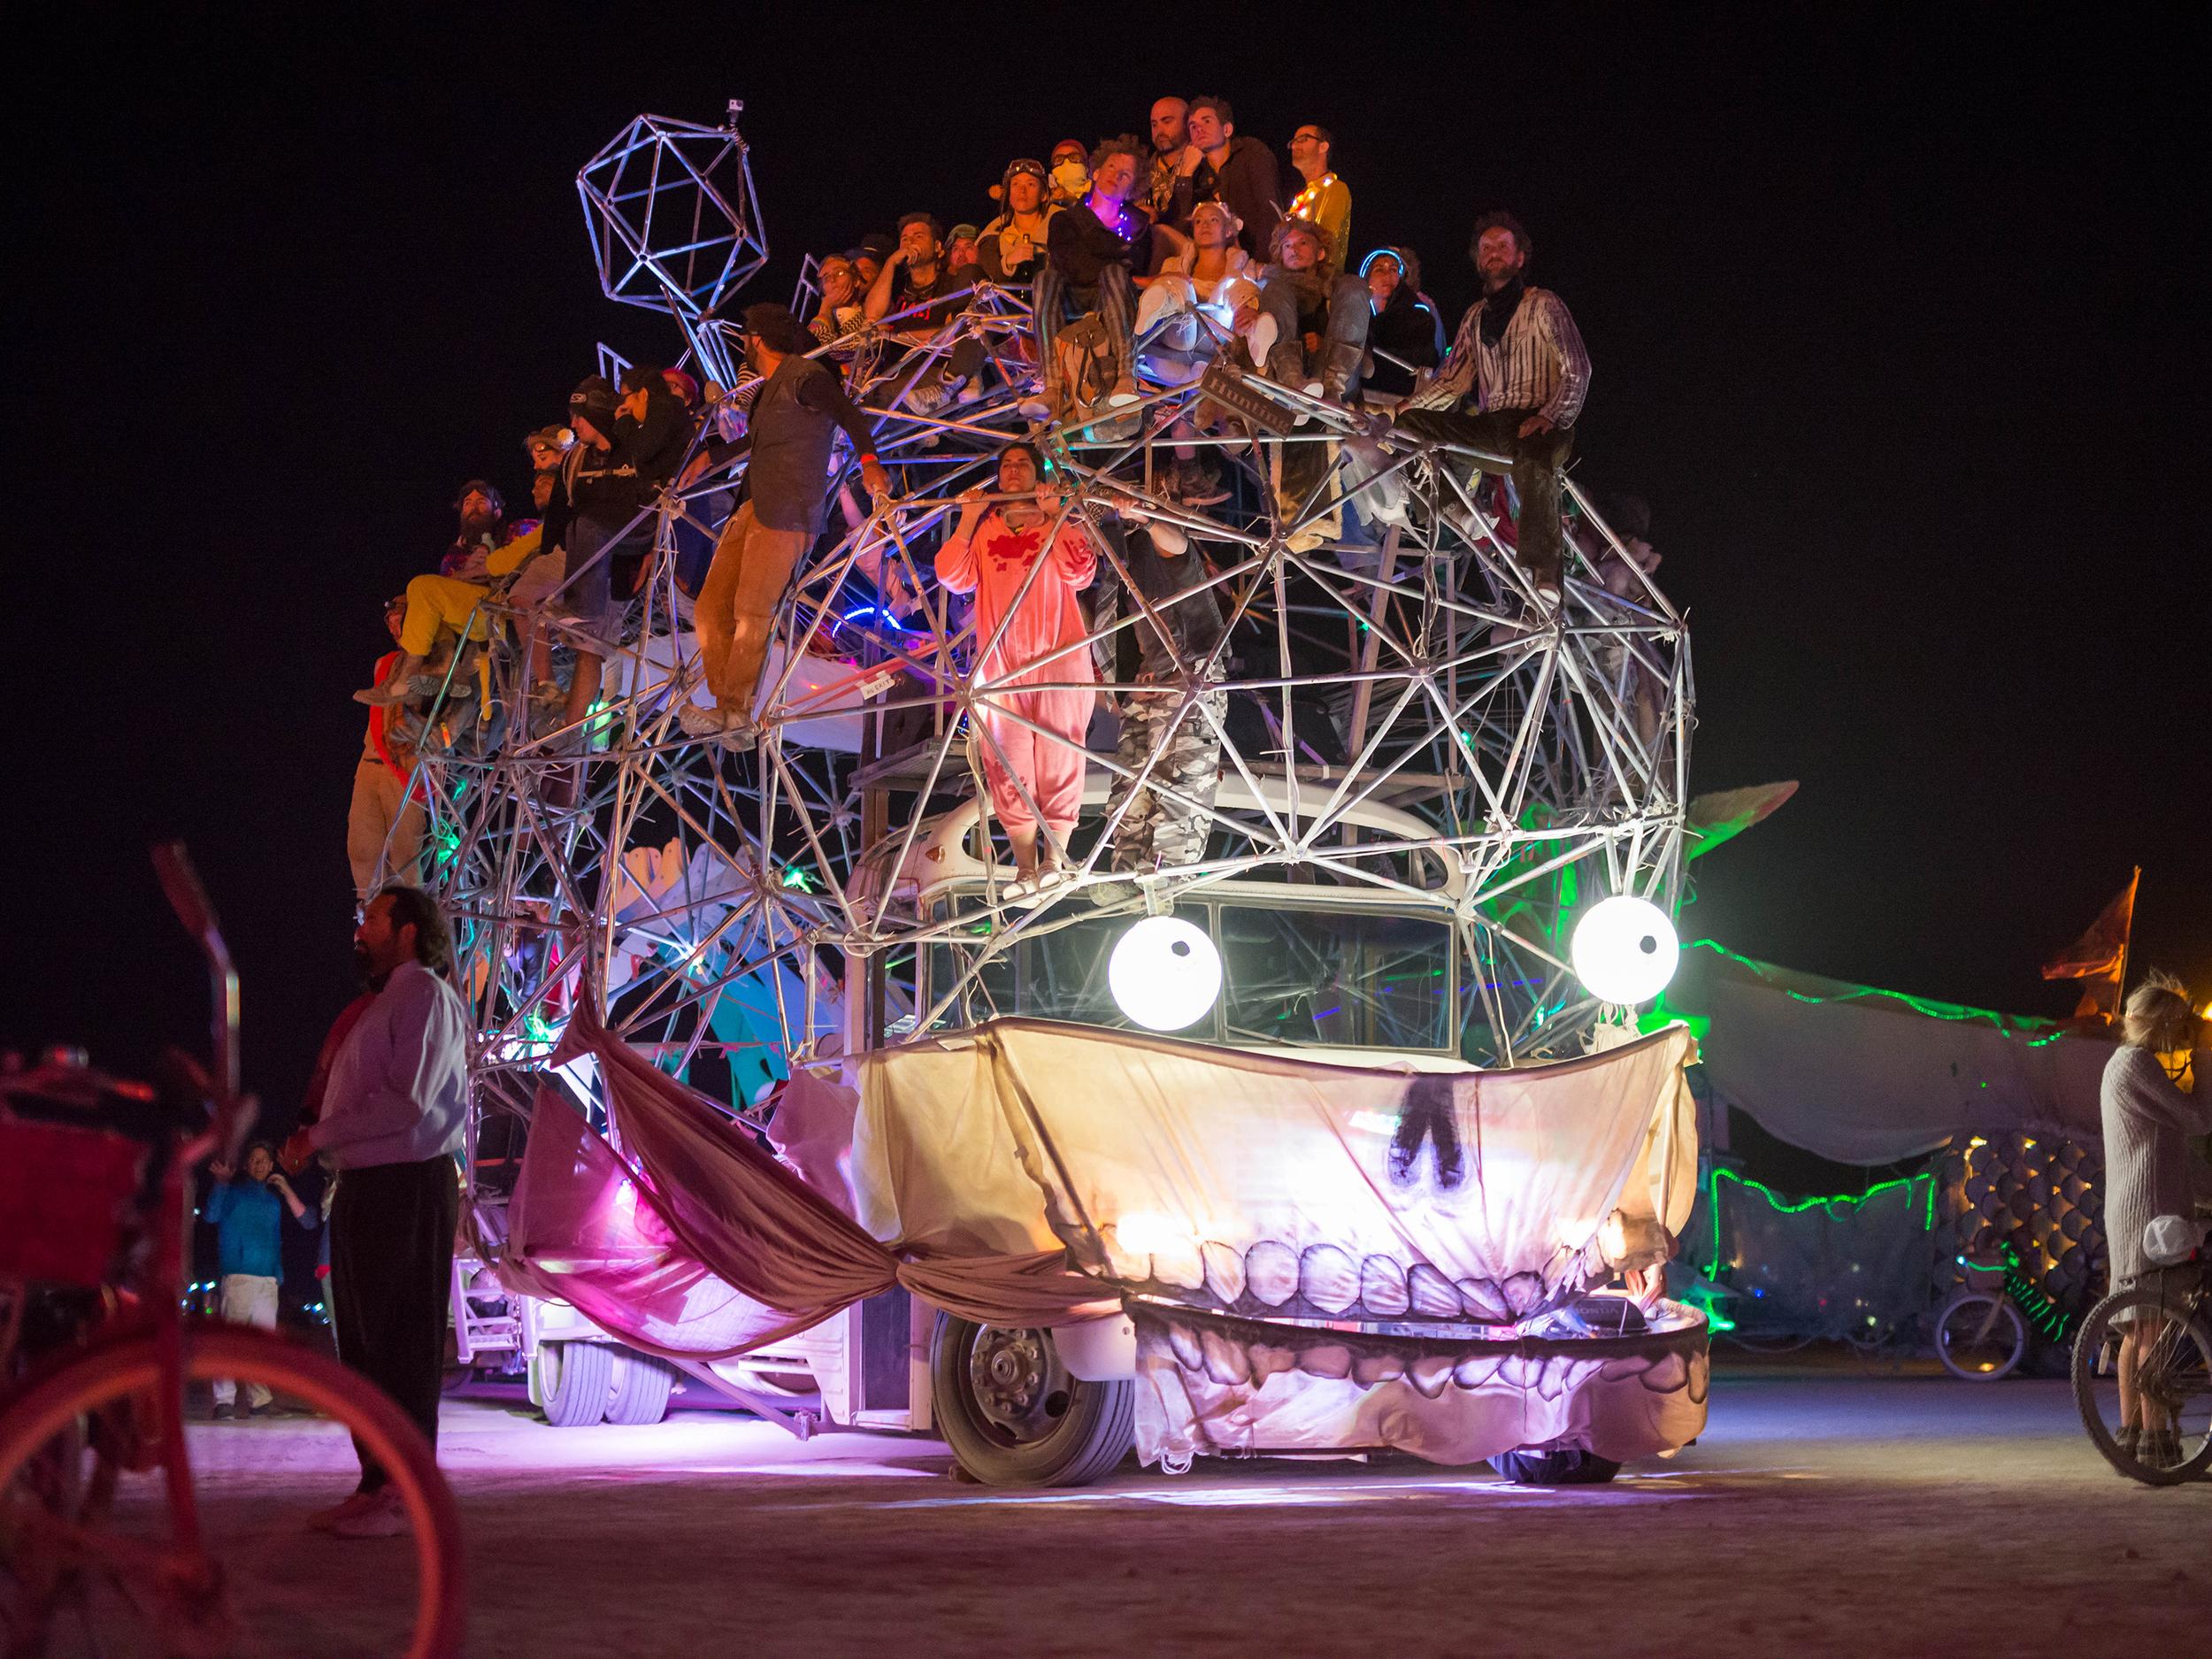 Dr. Brainlove at Burning Man 2014. Copyright:Shira Brettman